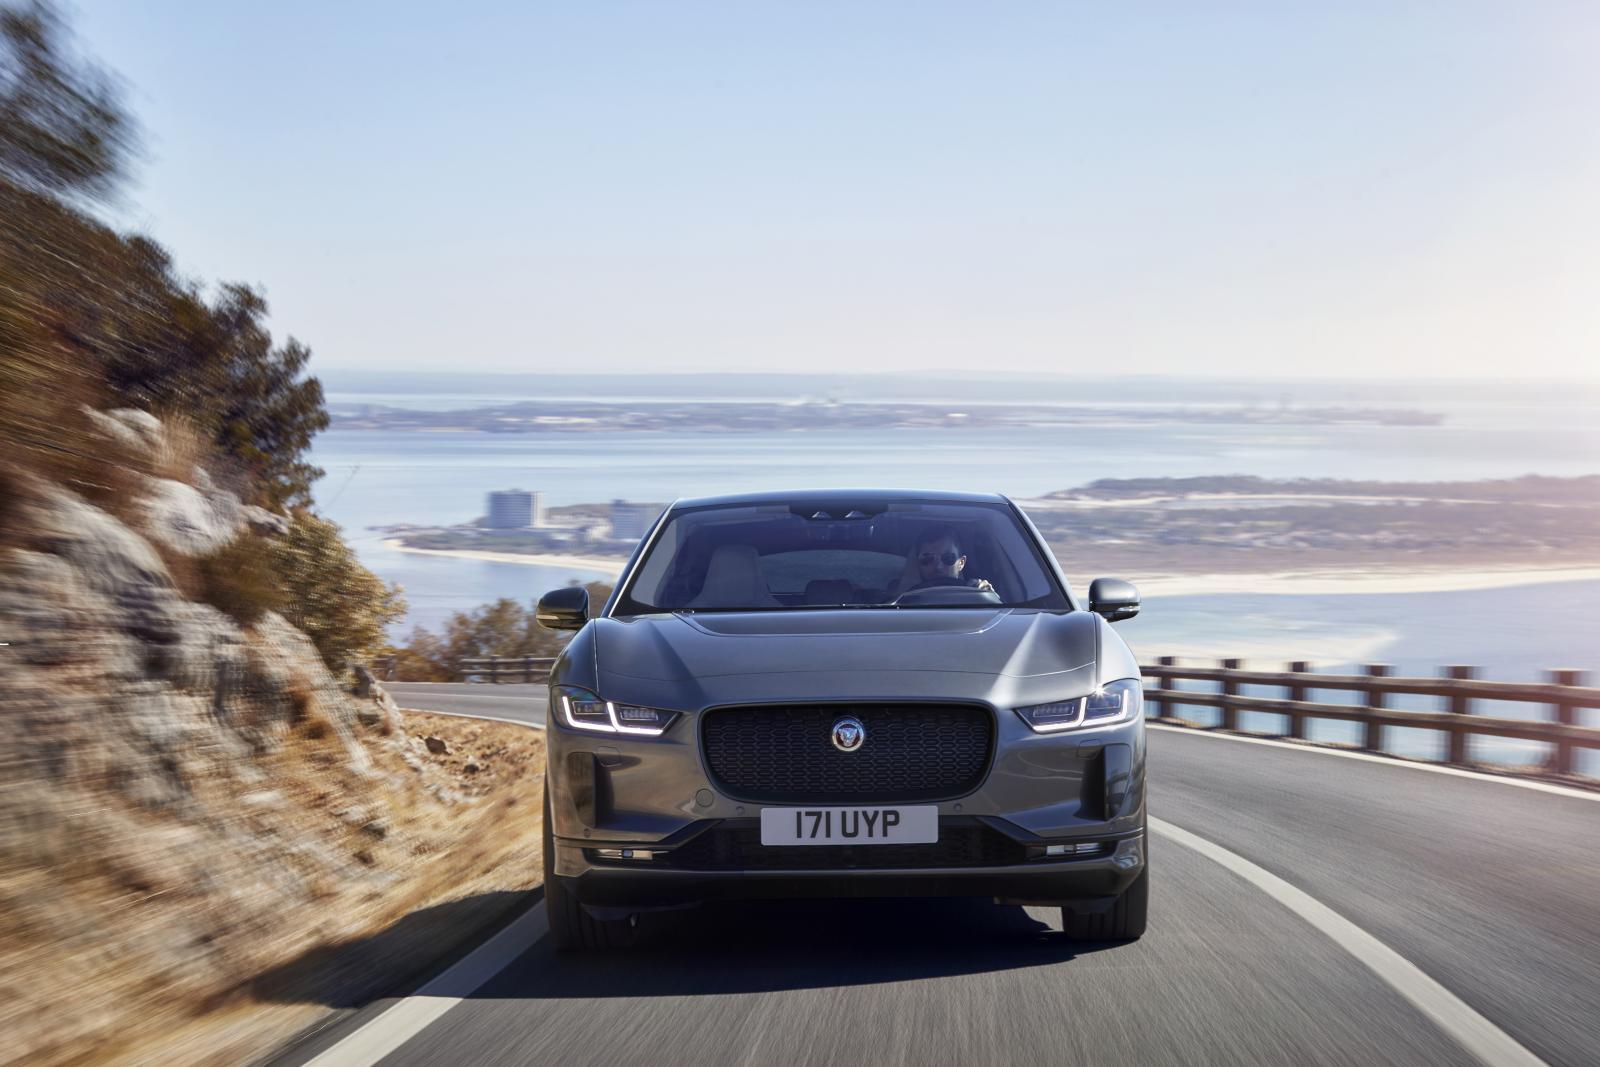 Eldrivna Jaguar I-Pace klarar 48 mil